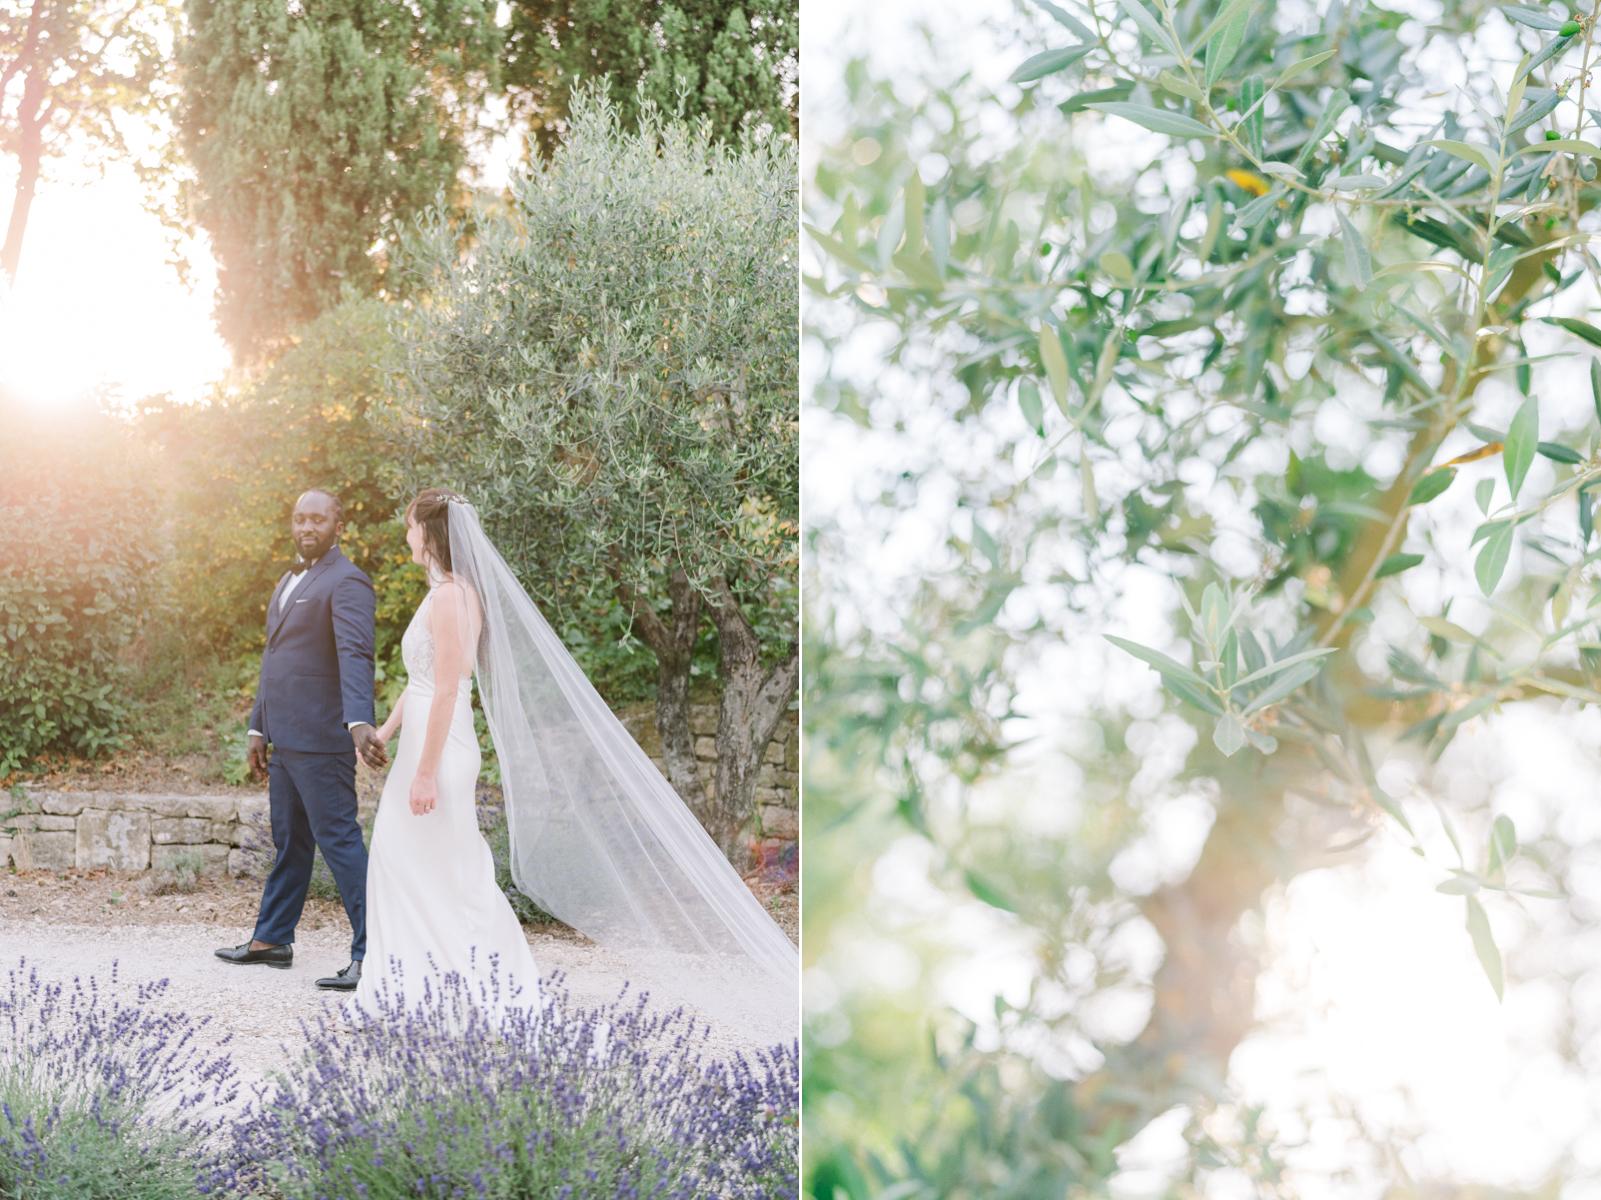 Boheme-Moon-Photography-Wedding-in-Provence-France_025.jpg